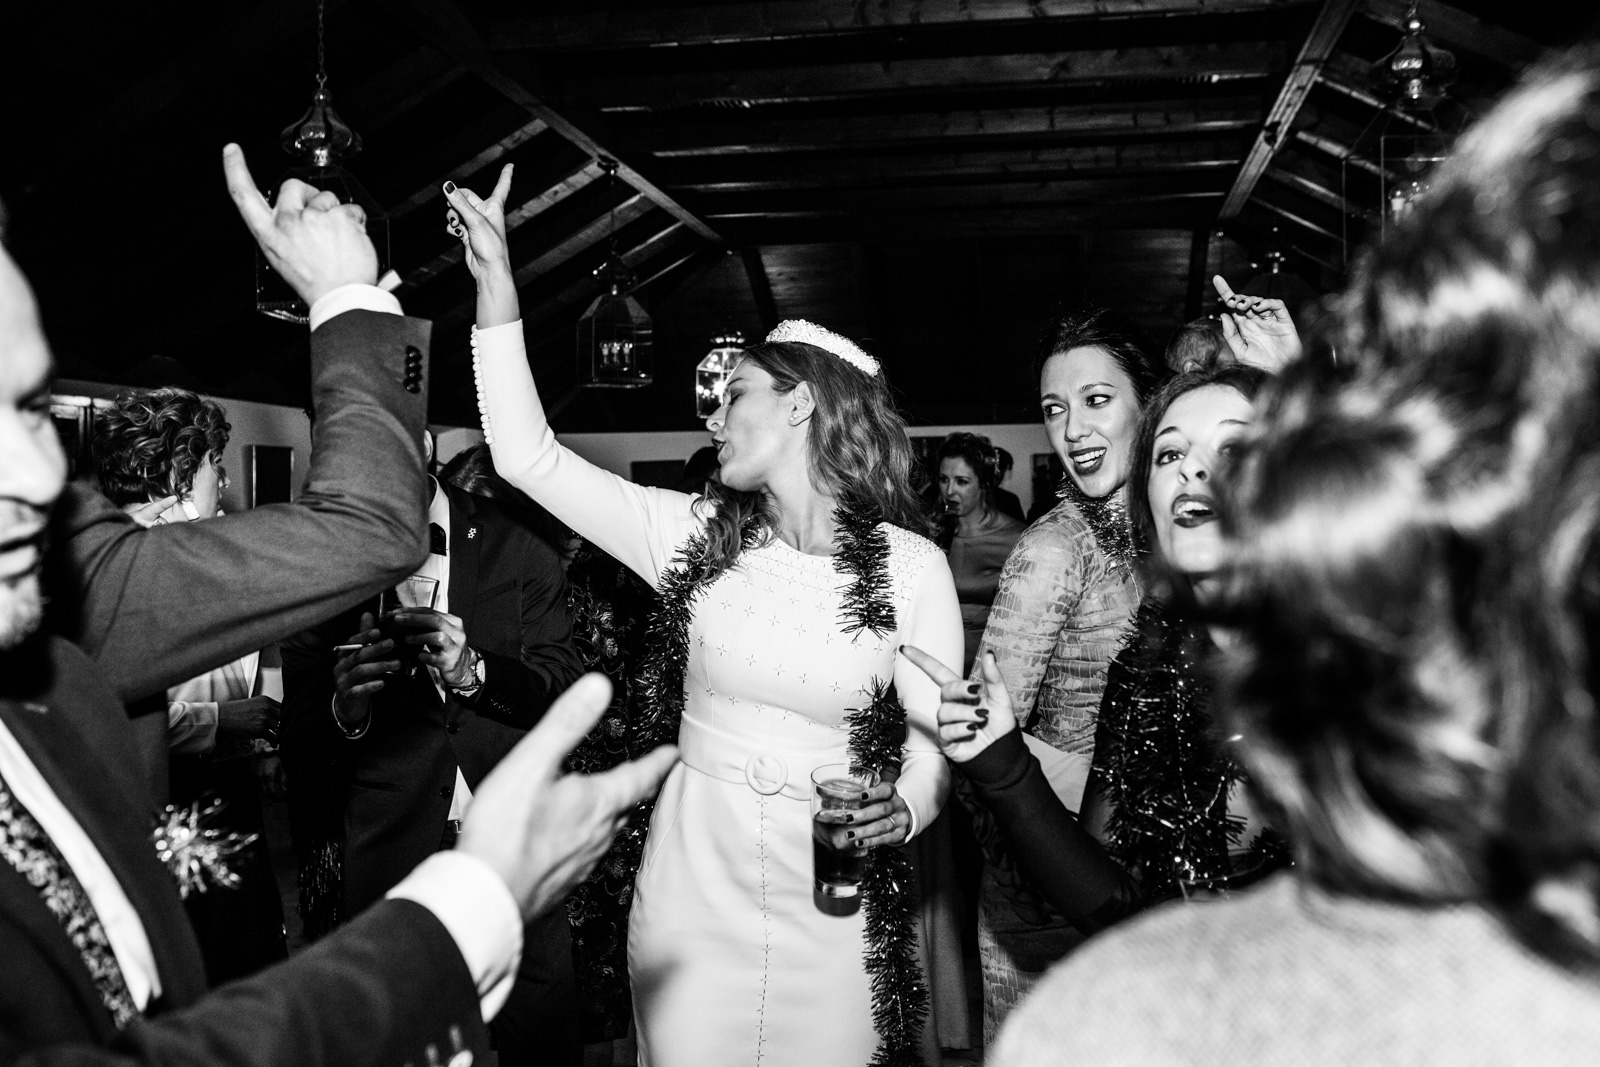 Wedroads-Boda-Sevilla-Parador-Carmona-bridal-engagement-Rafael-Torres-fotografo-bodas-sevilla-madrid-barcelona-wedding-photographer--73.jpg